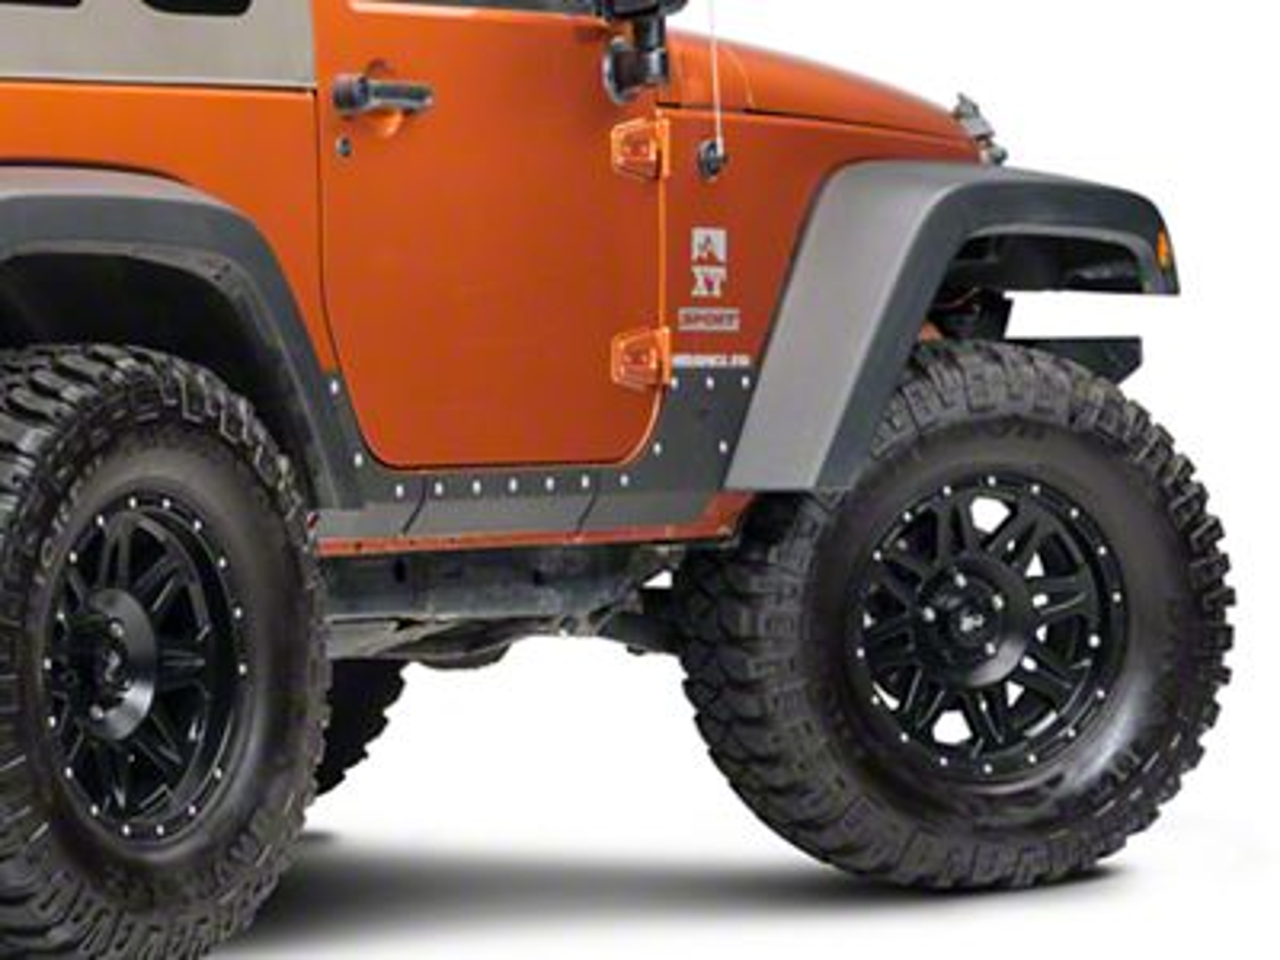 Smittybilt XRC Body Cladding - Black Textured (07-18 Jeep Wrangler JK 2 Door)